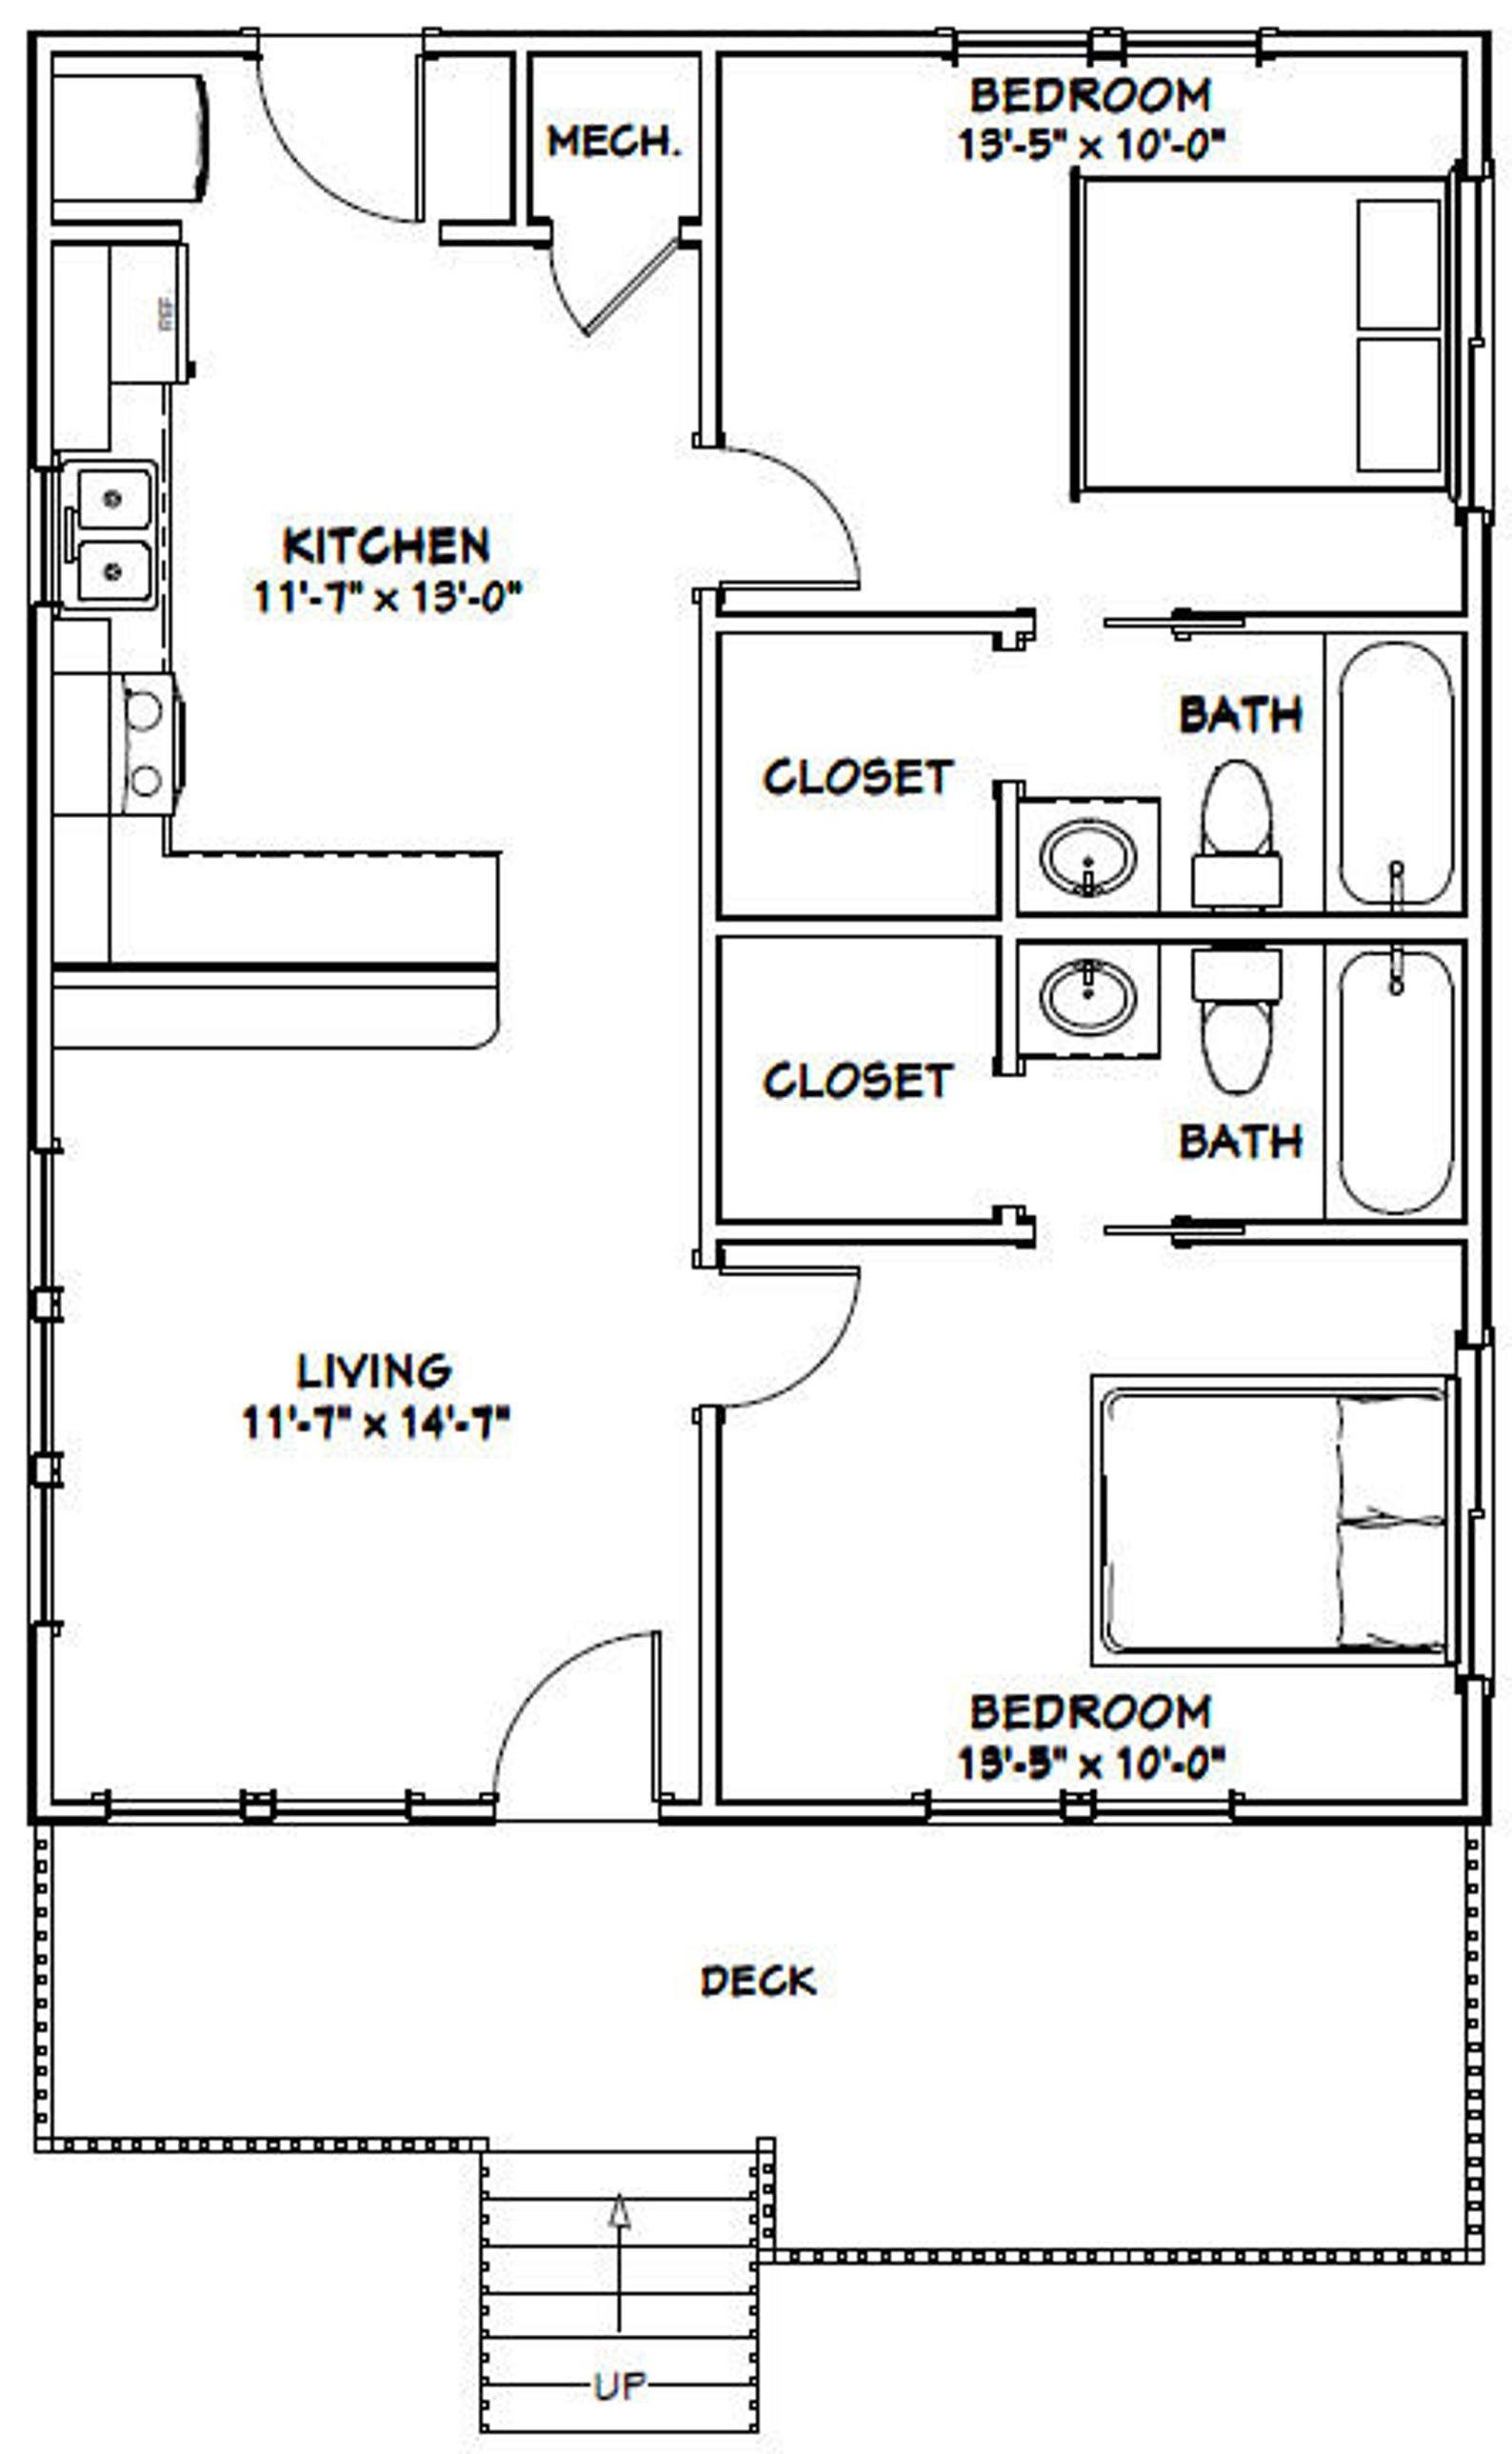 26x32 House 2 Bedroom 2 Bath 832 Sq Ft Pdf Floor Plan Etsy In 2020 Tiny House Floor Plans Floor Plans How To Plan